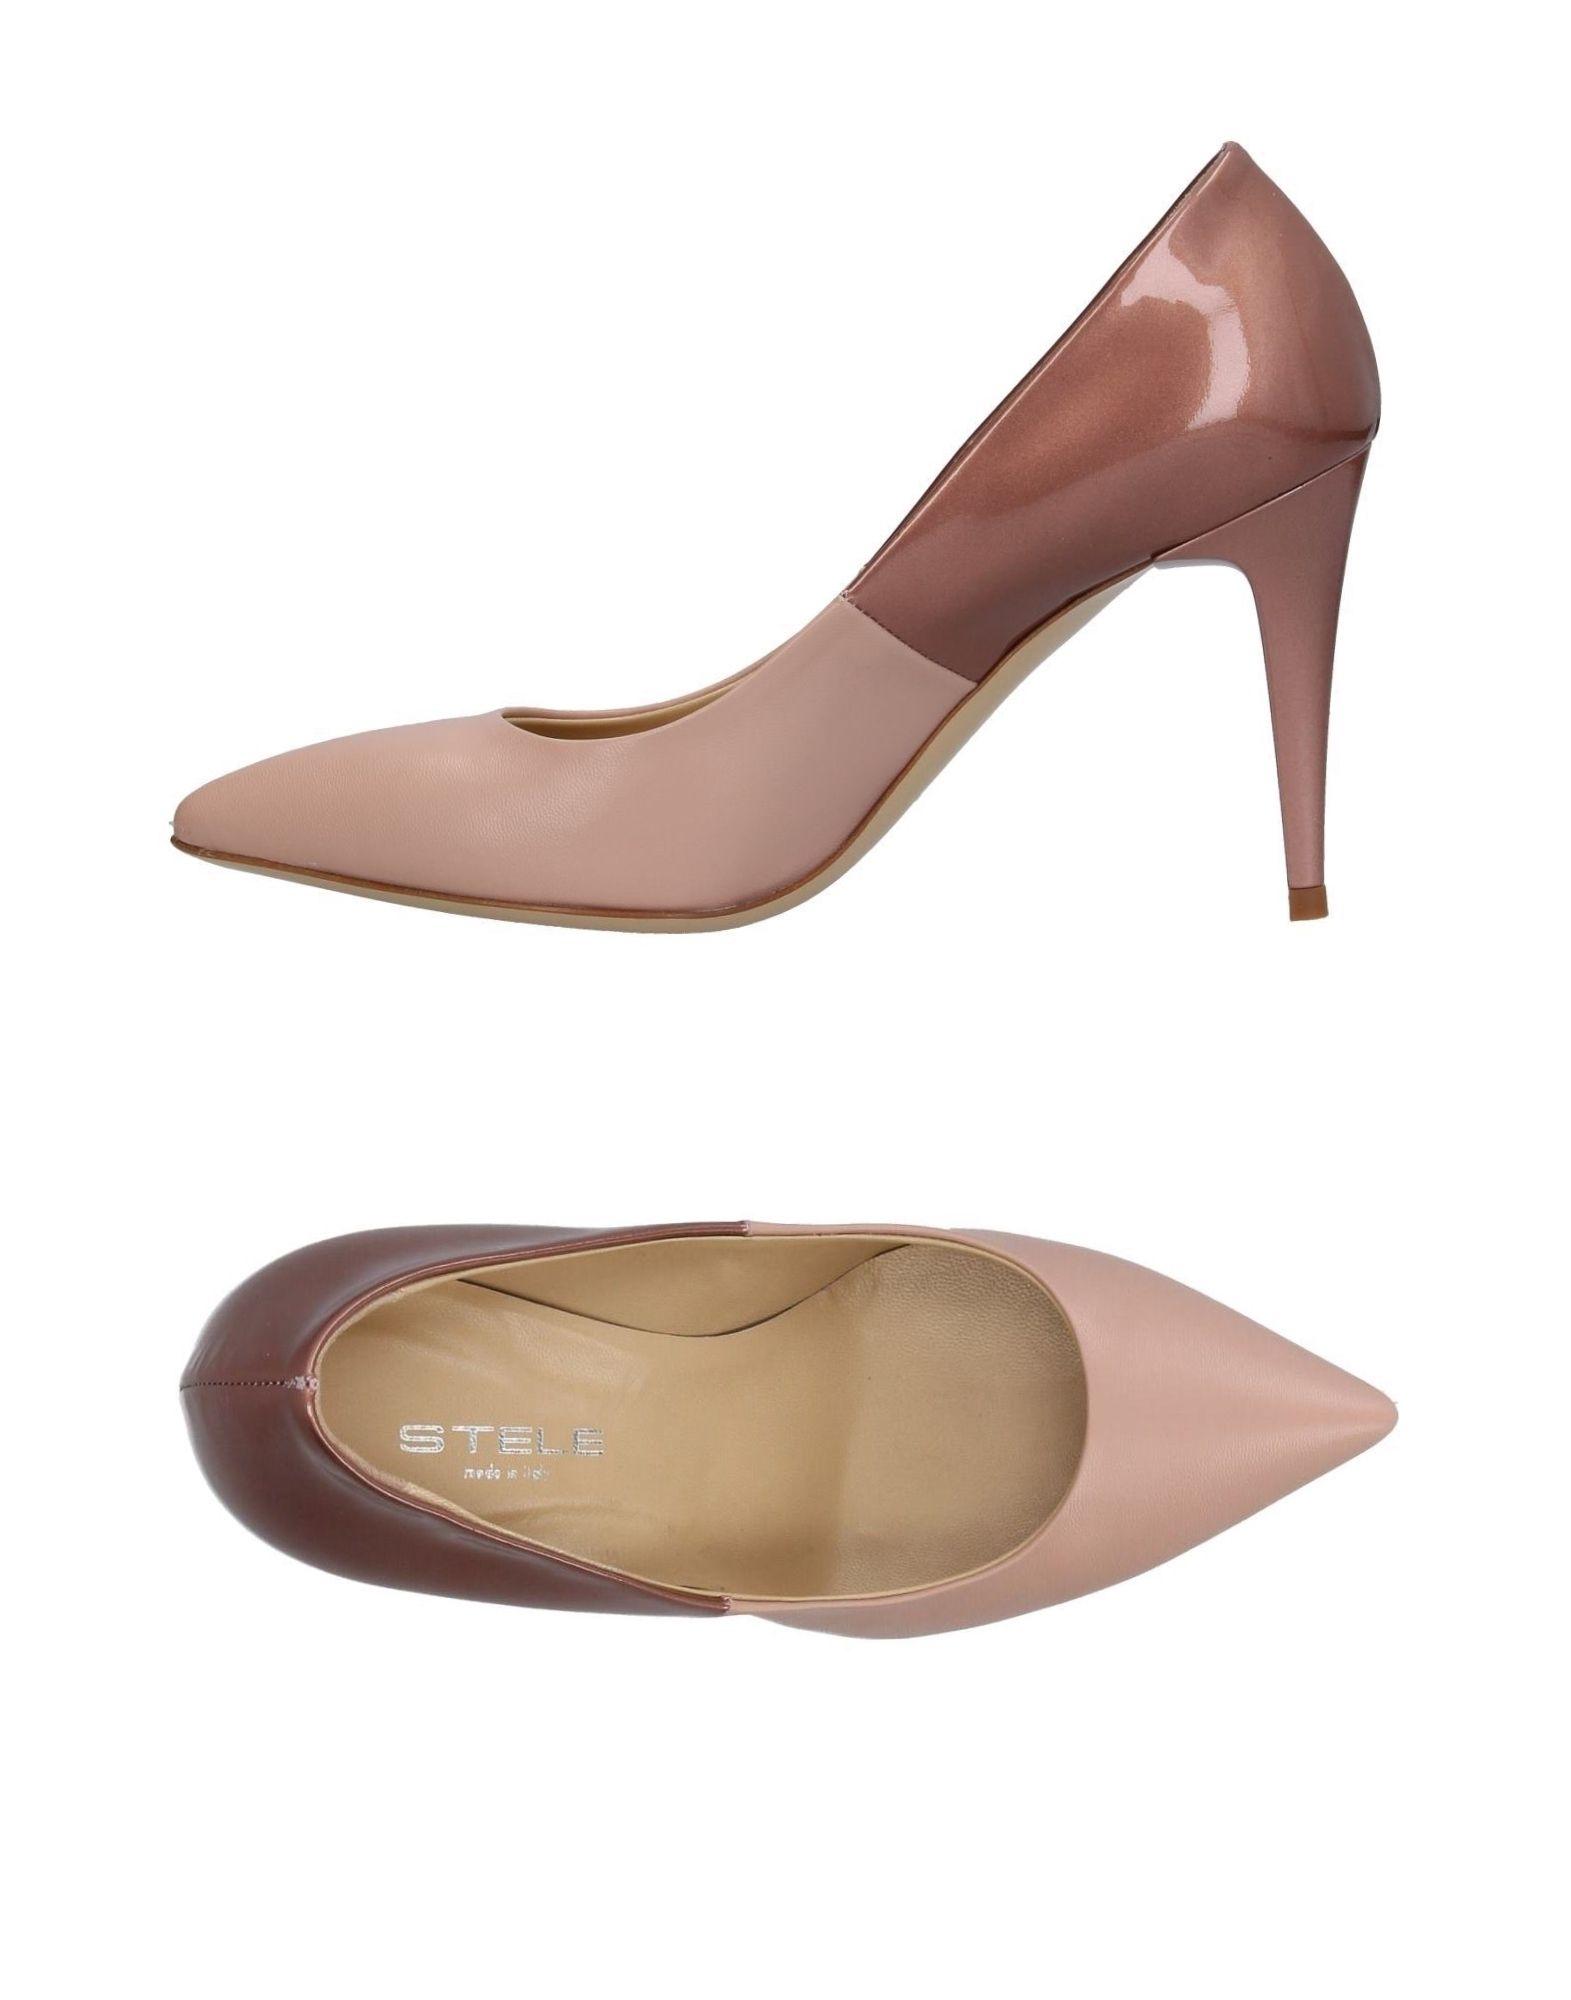 Stele Pumps Damen  11376169JE Gute Qualität beliebte Schuhe